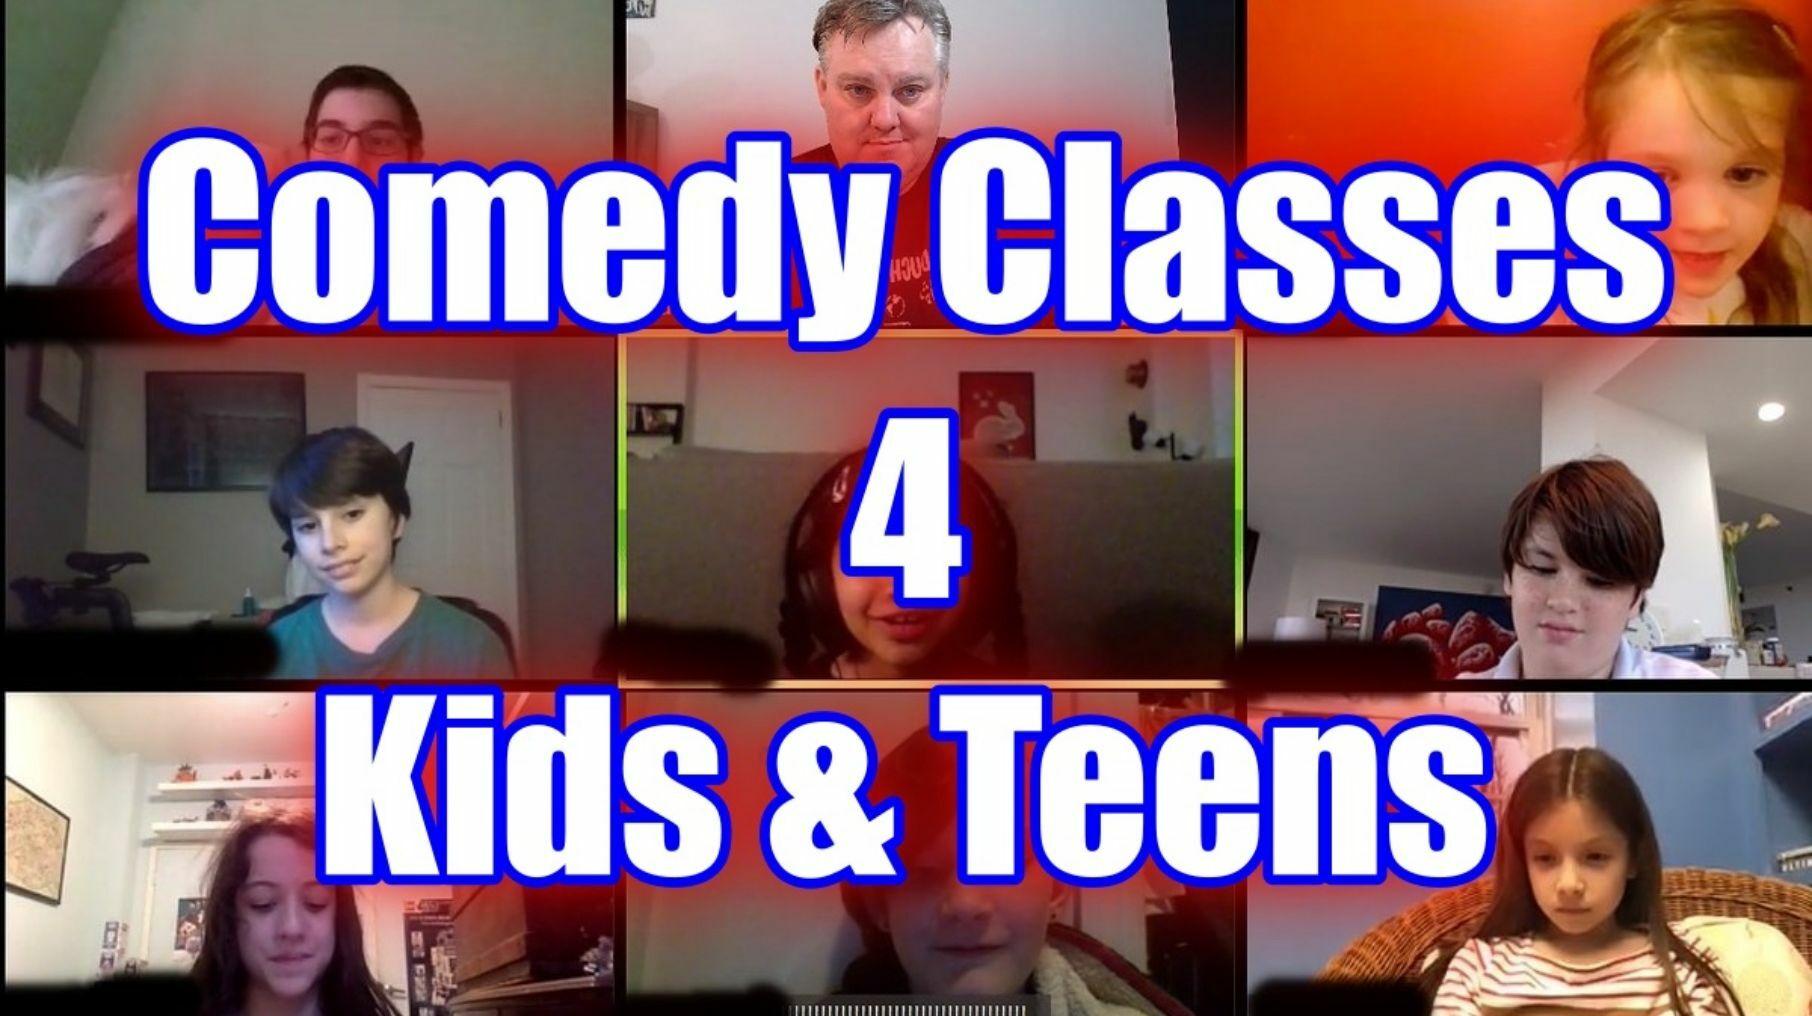 Comedy 4 Kids Online Classes